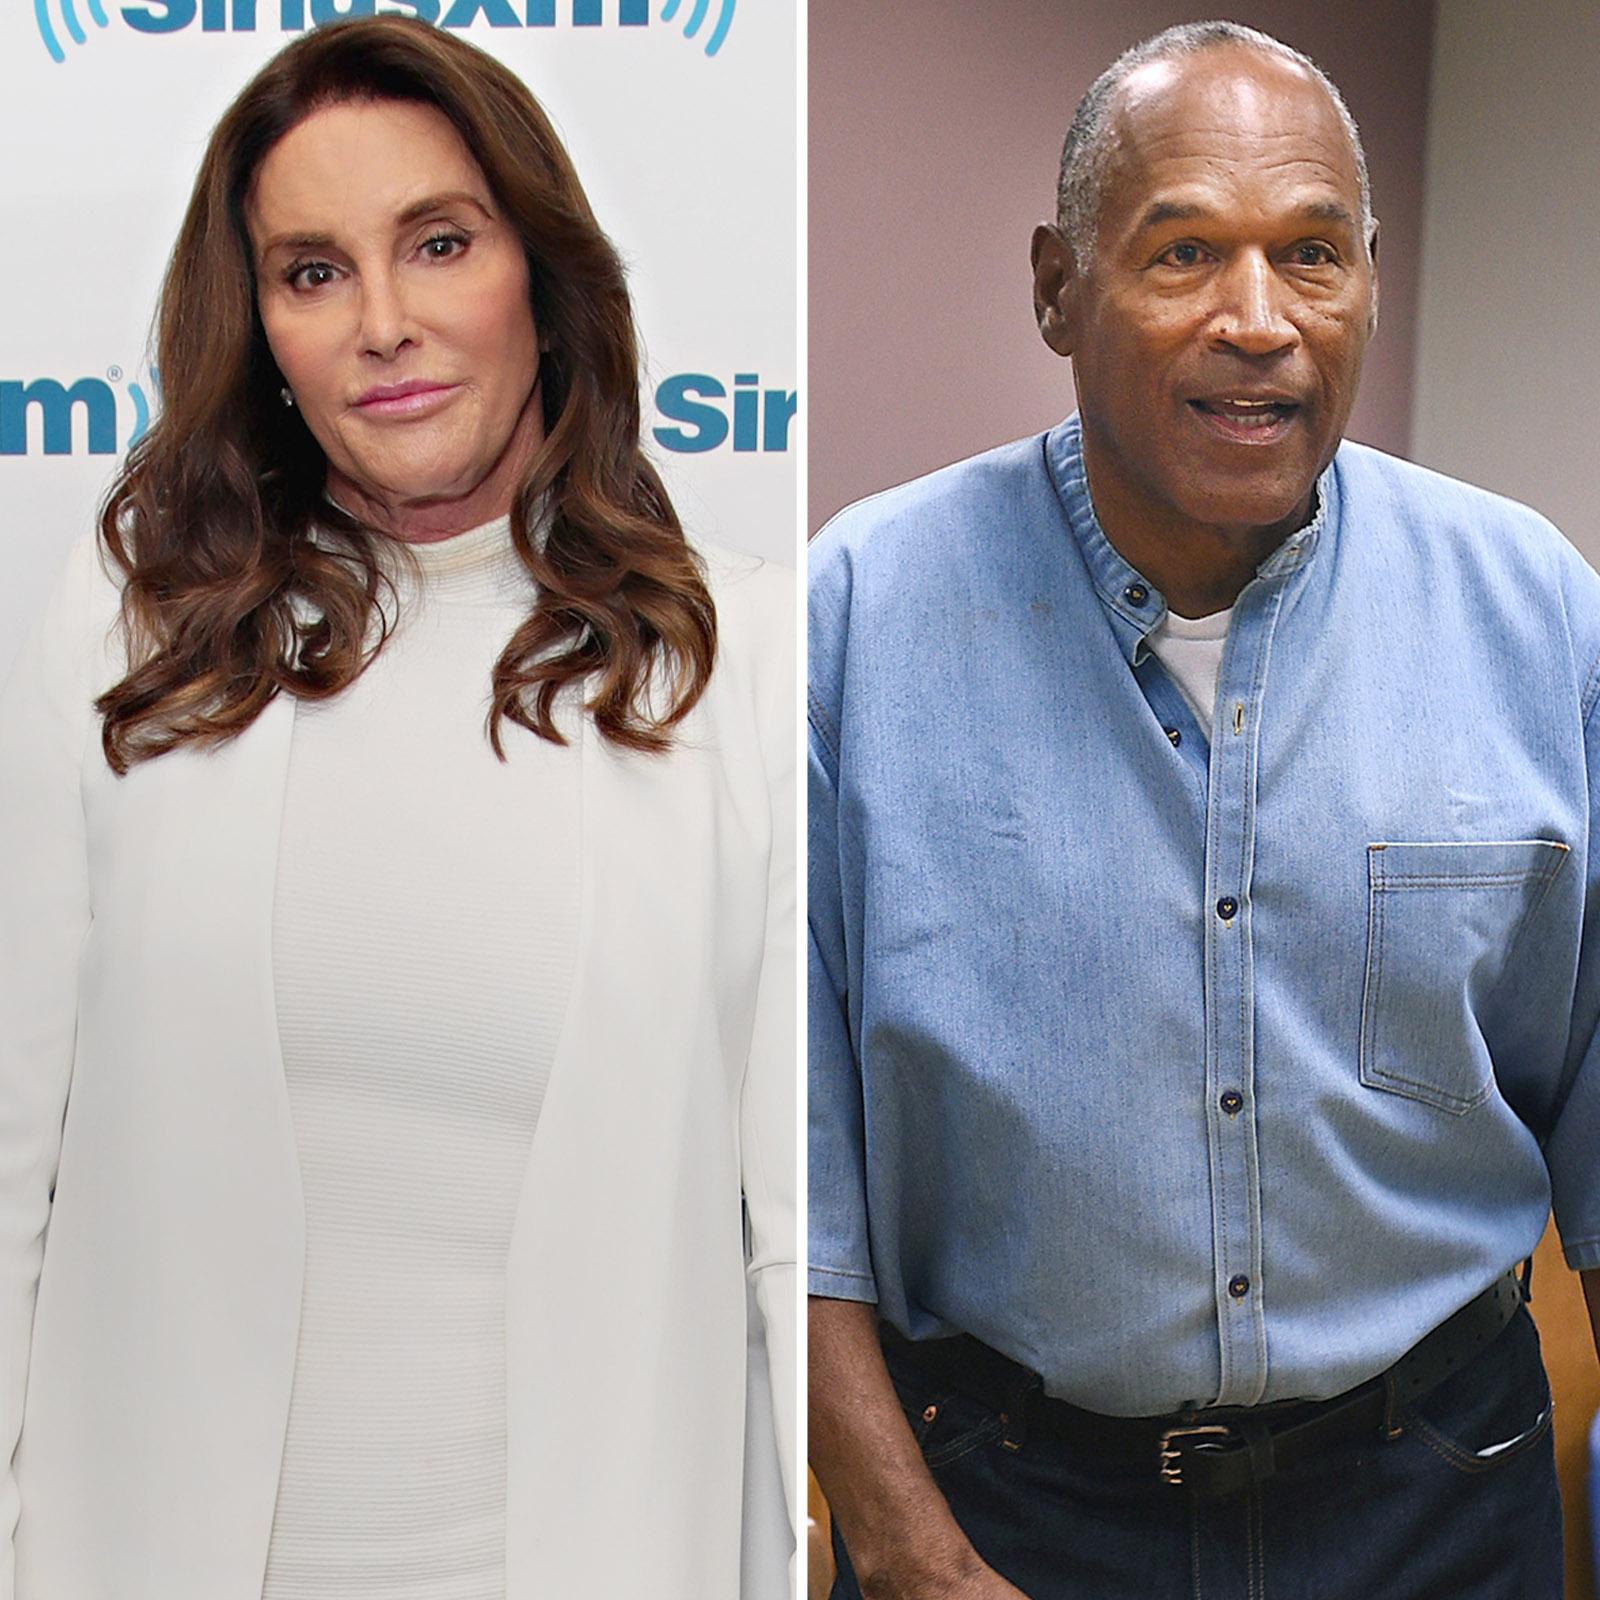 Caitlyn Jenner y O.J. Simpson